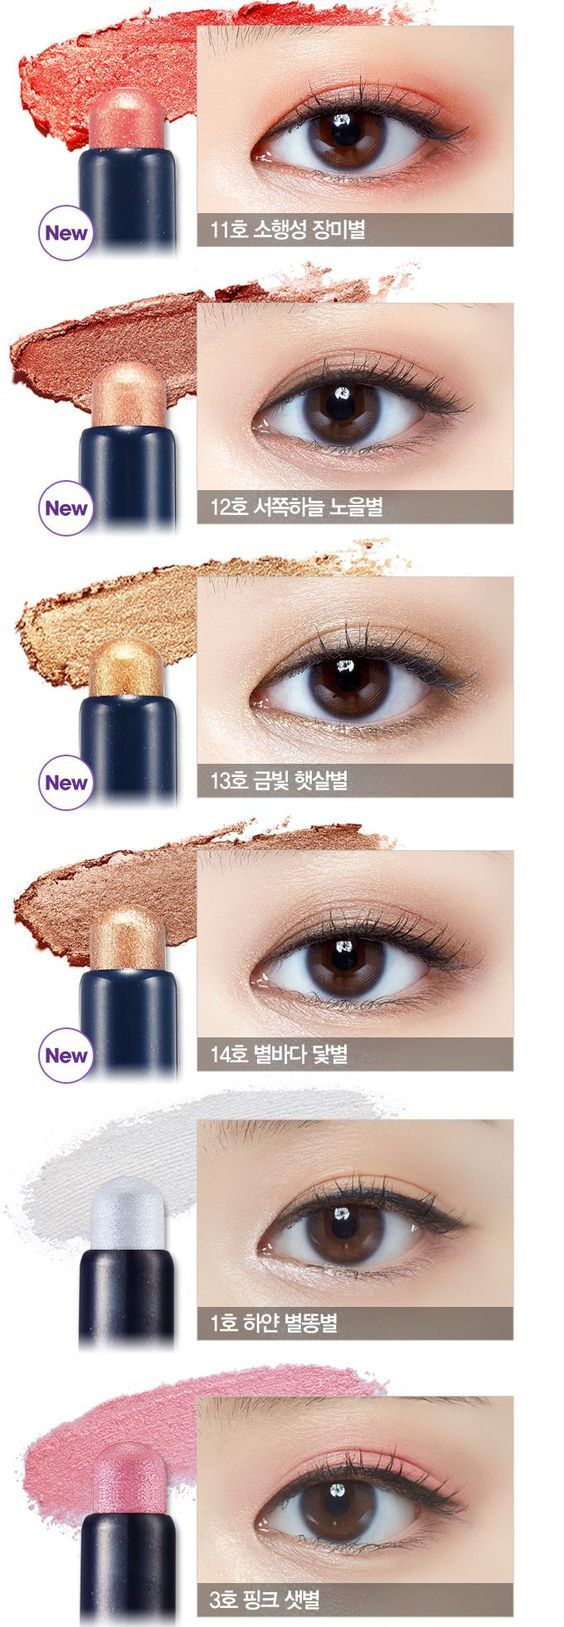 Etude House Bling Bling Eye Stick Eyeshadow: